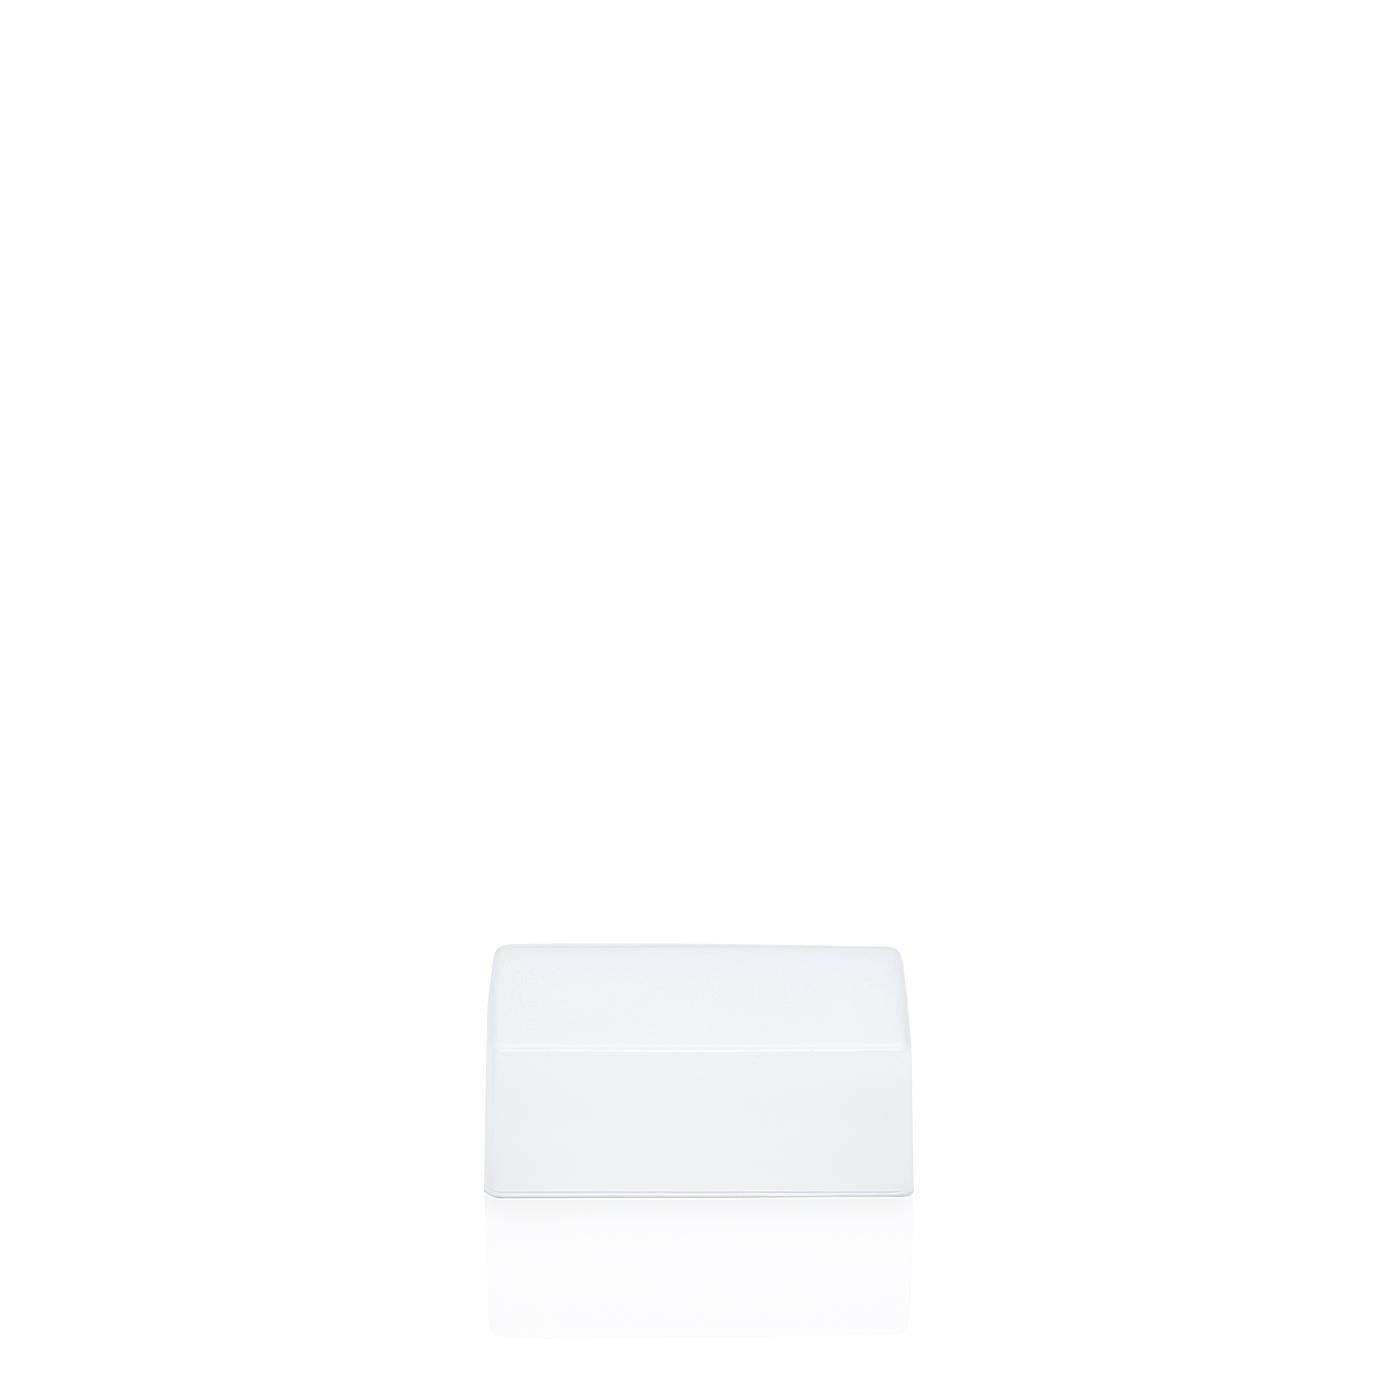 Butterdose Deckel Tric Kunststoff transparent Arzberg